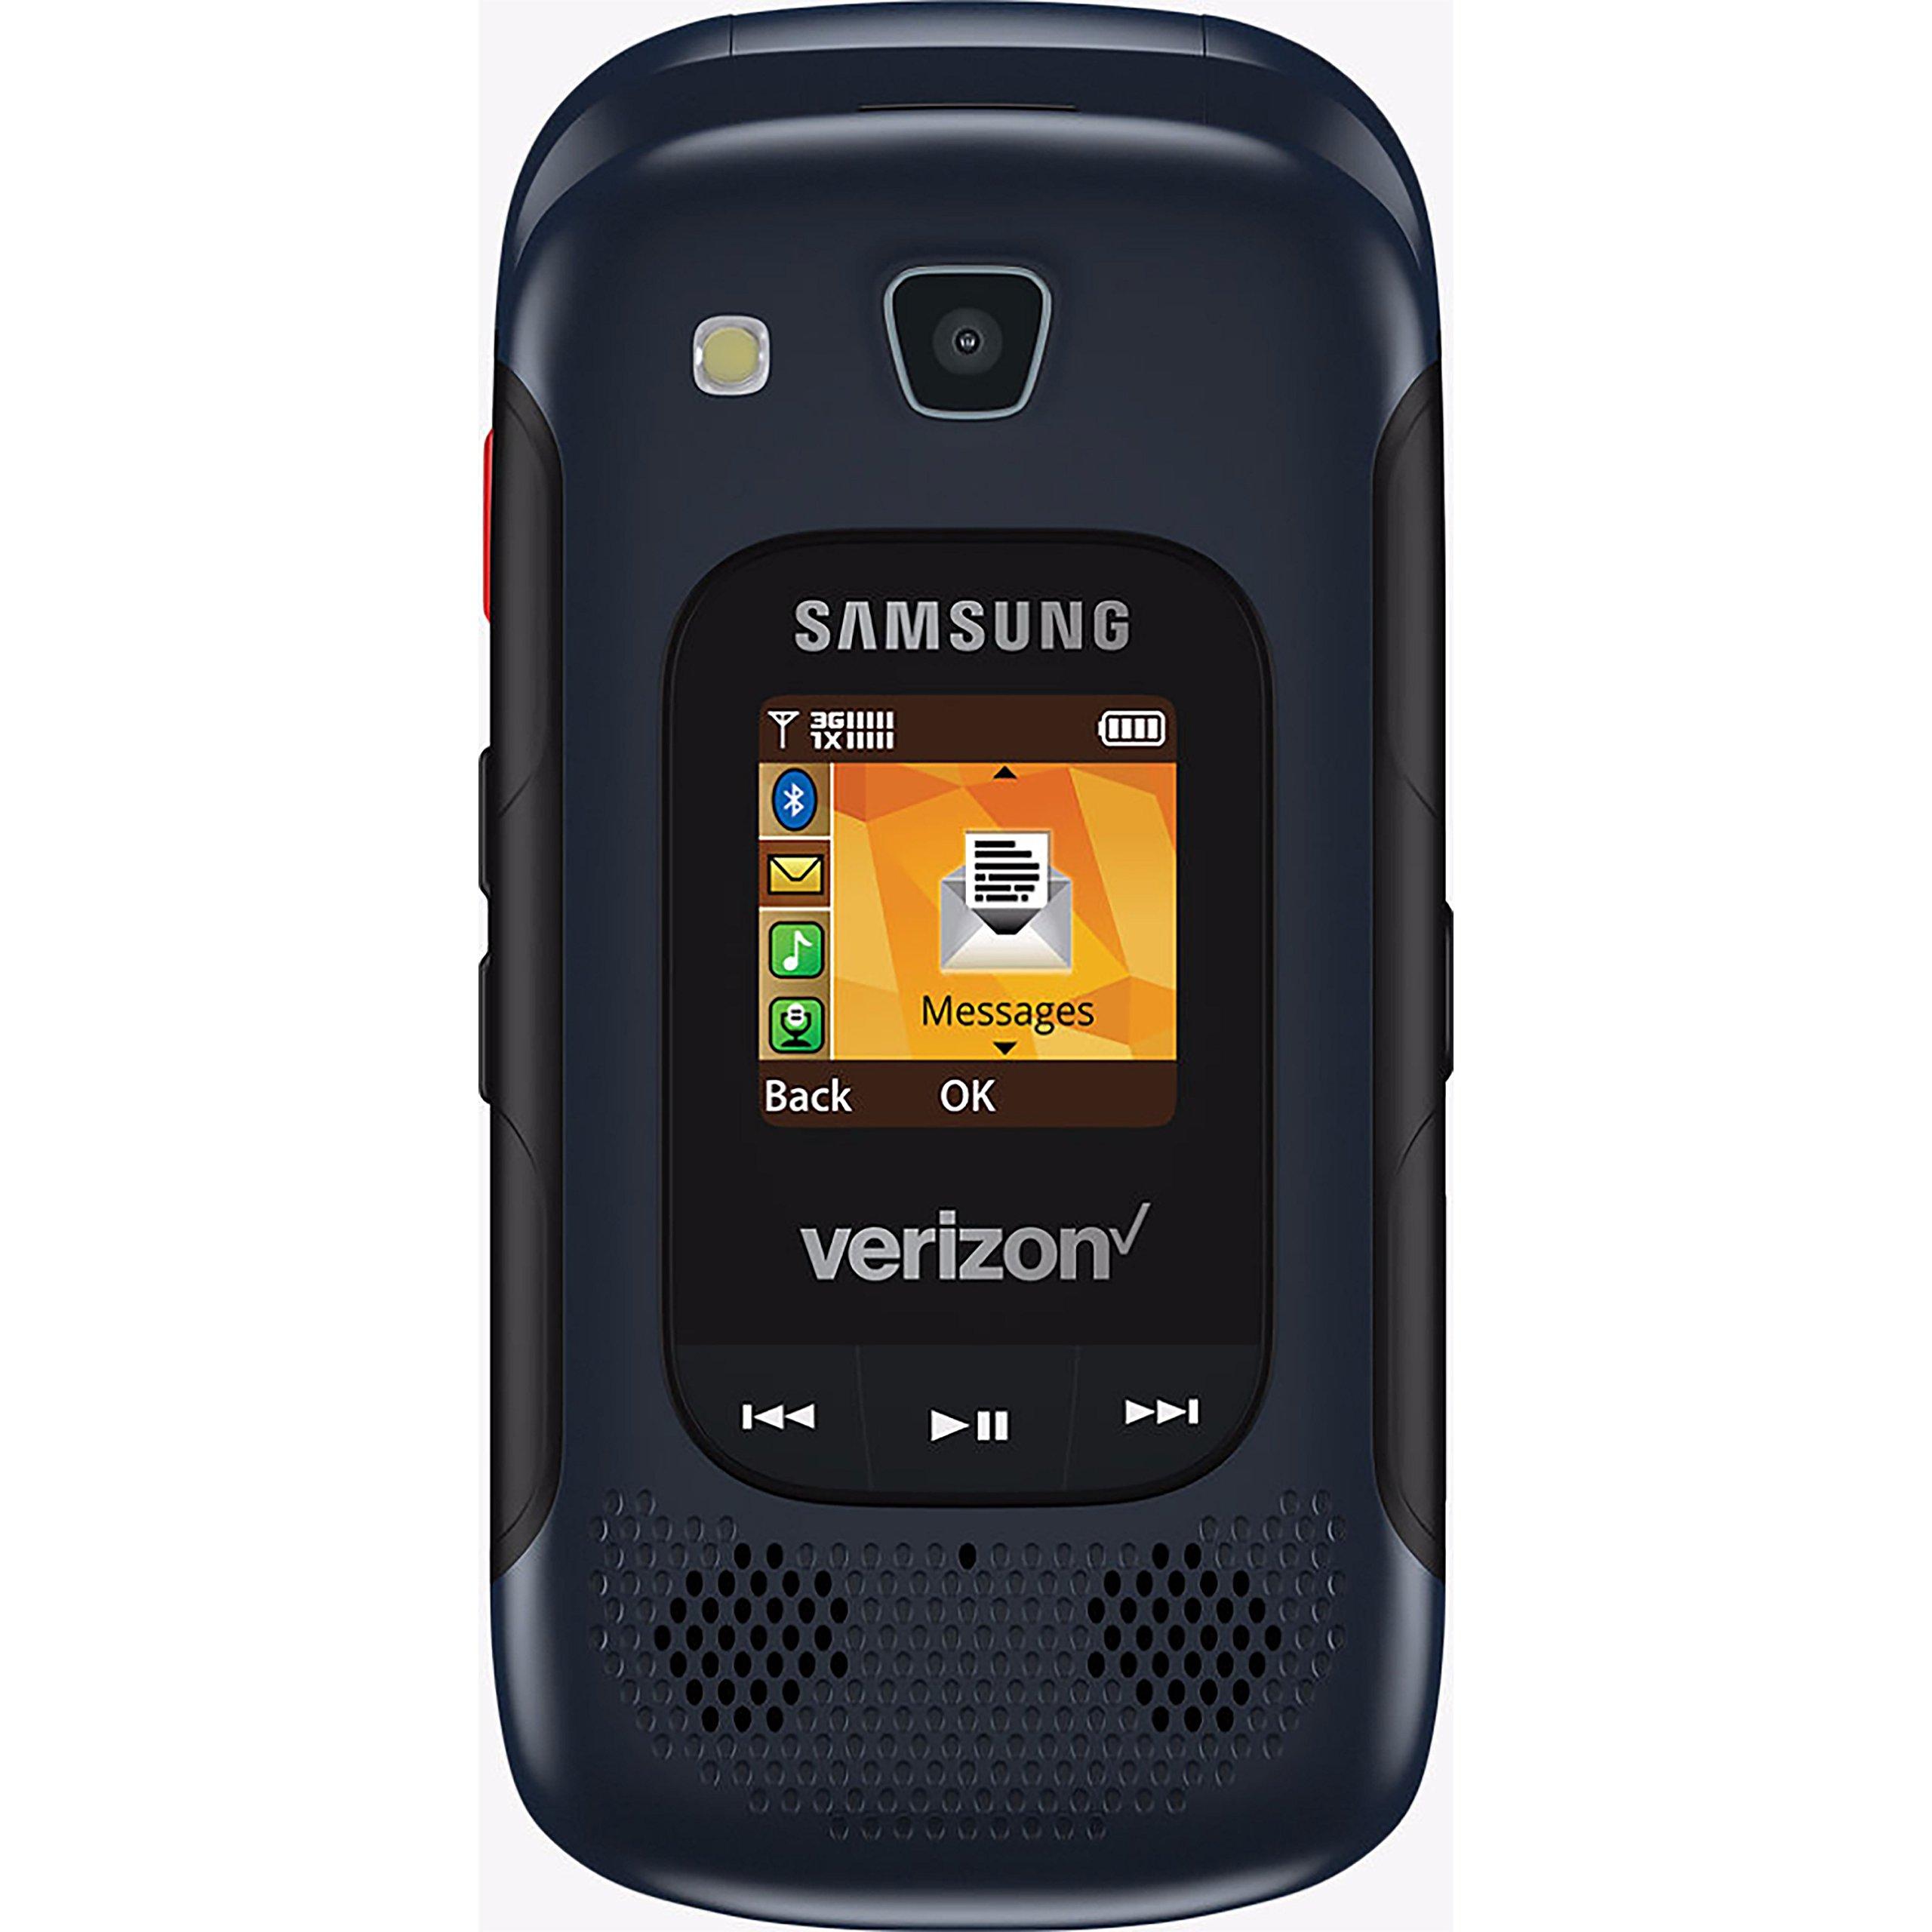 Samsung Convoy 4 B690 Rugged Water-Resistant Verizon Flip Phone w/ 5MP Camera - Blue